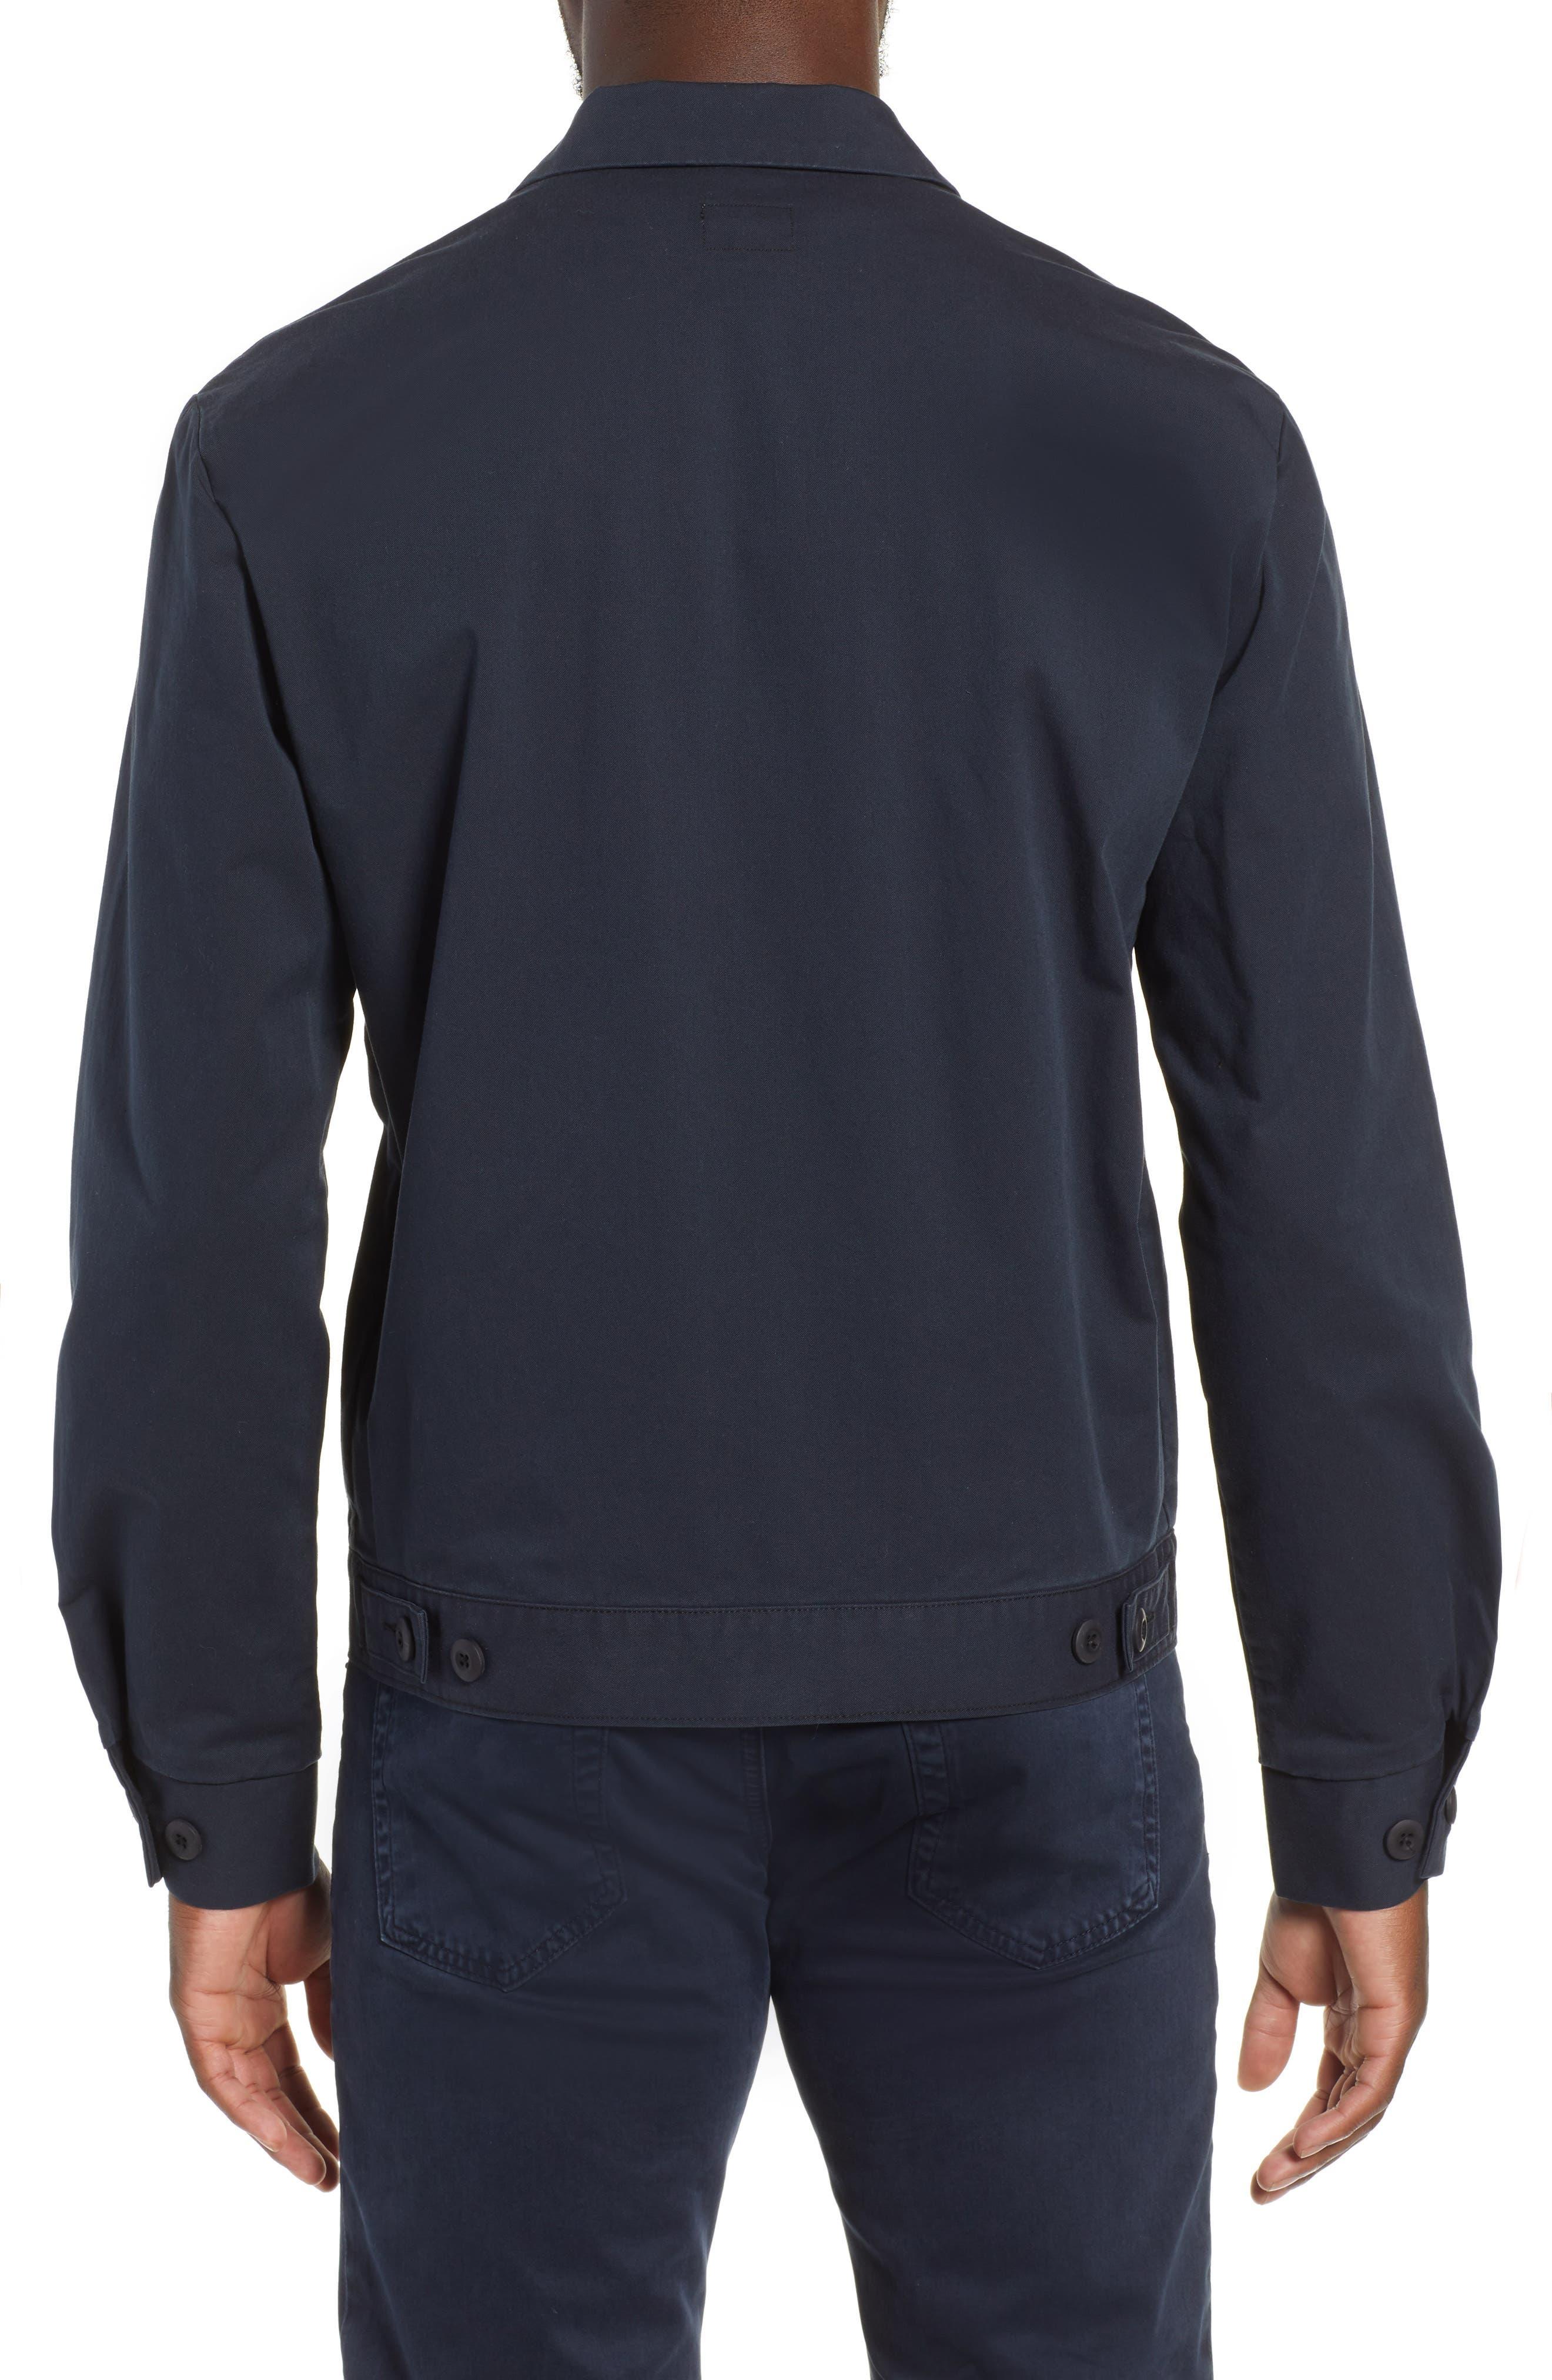 Axle Shop Regular Stretch Cotton Blend Jacket,                             Alternate thumbnail 2, color,                             BLUE VAULT/ BLACK